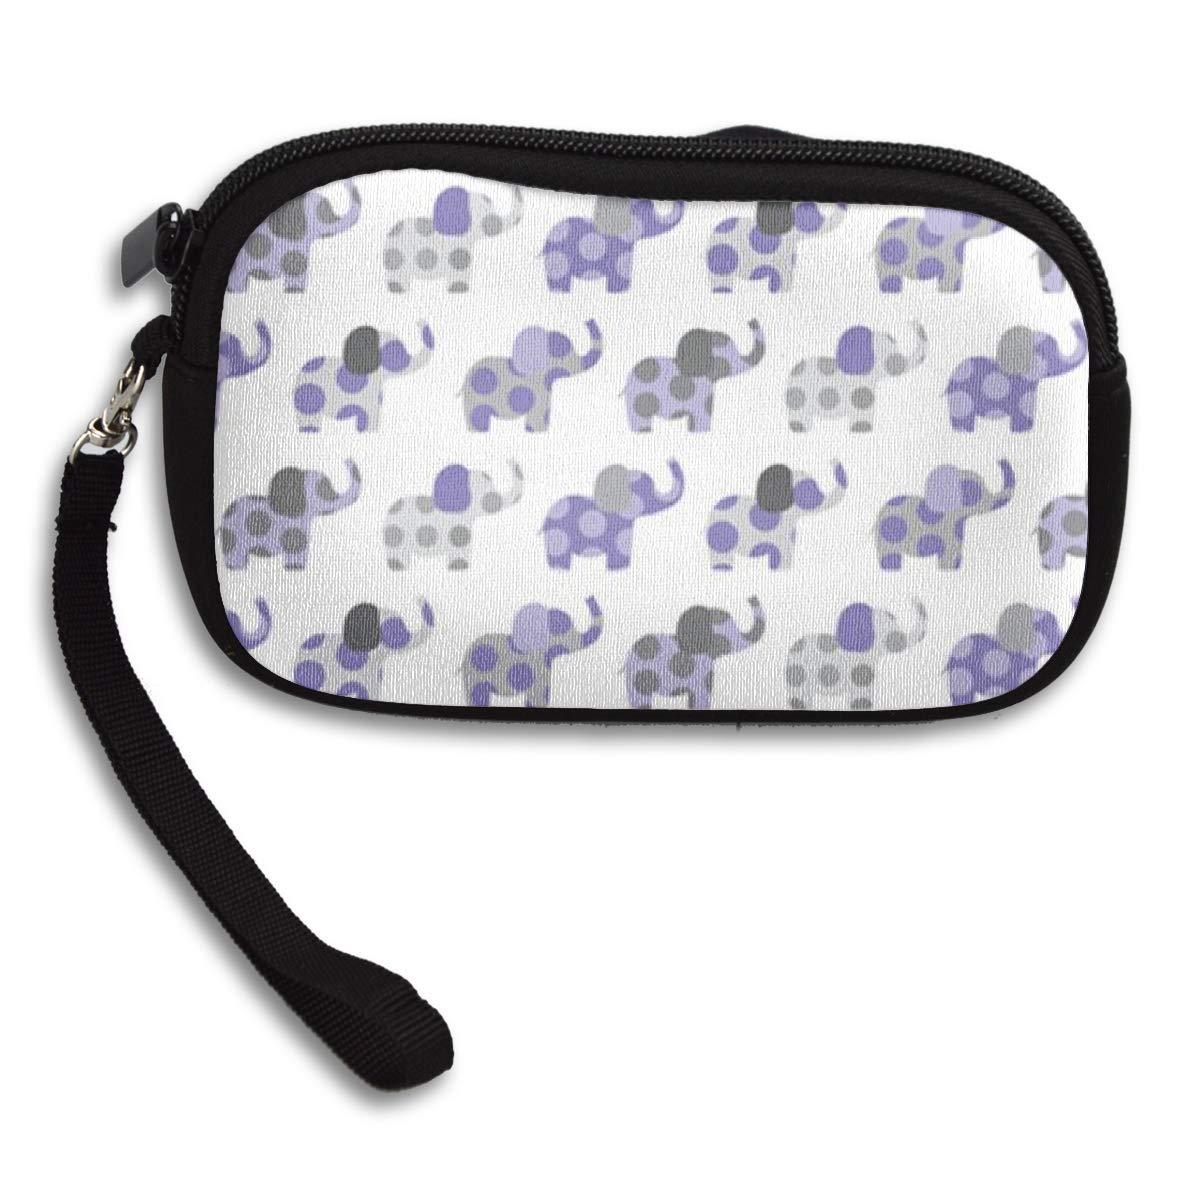 Coin Purse Elephant Friends Purple Gray wallet change Purse with Zipper Wallet Coin Pouch Mini Size Cash Phone Holder